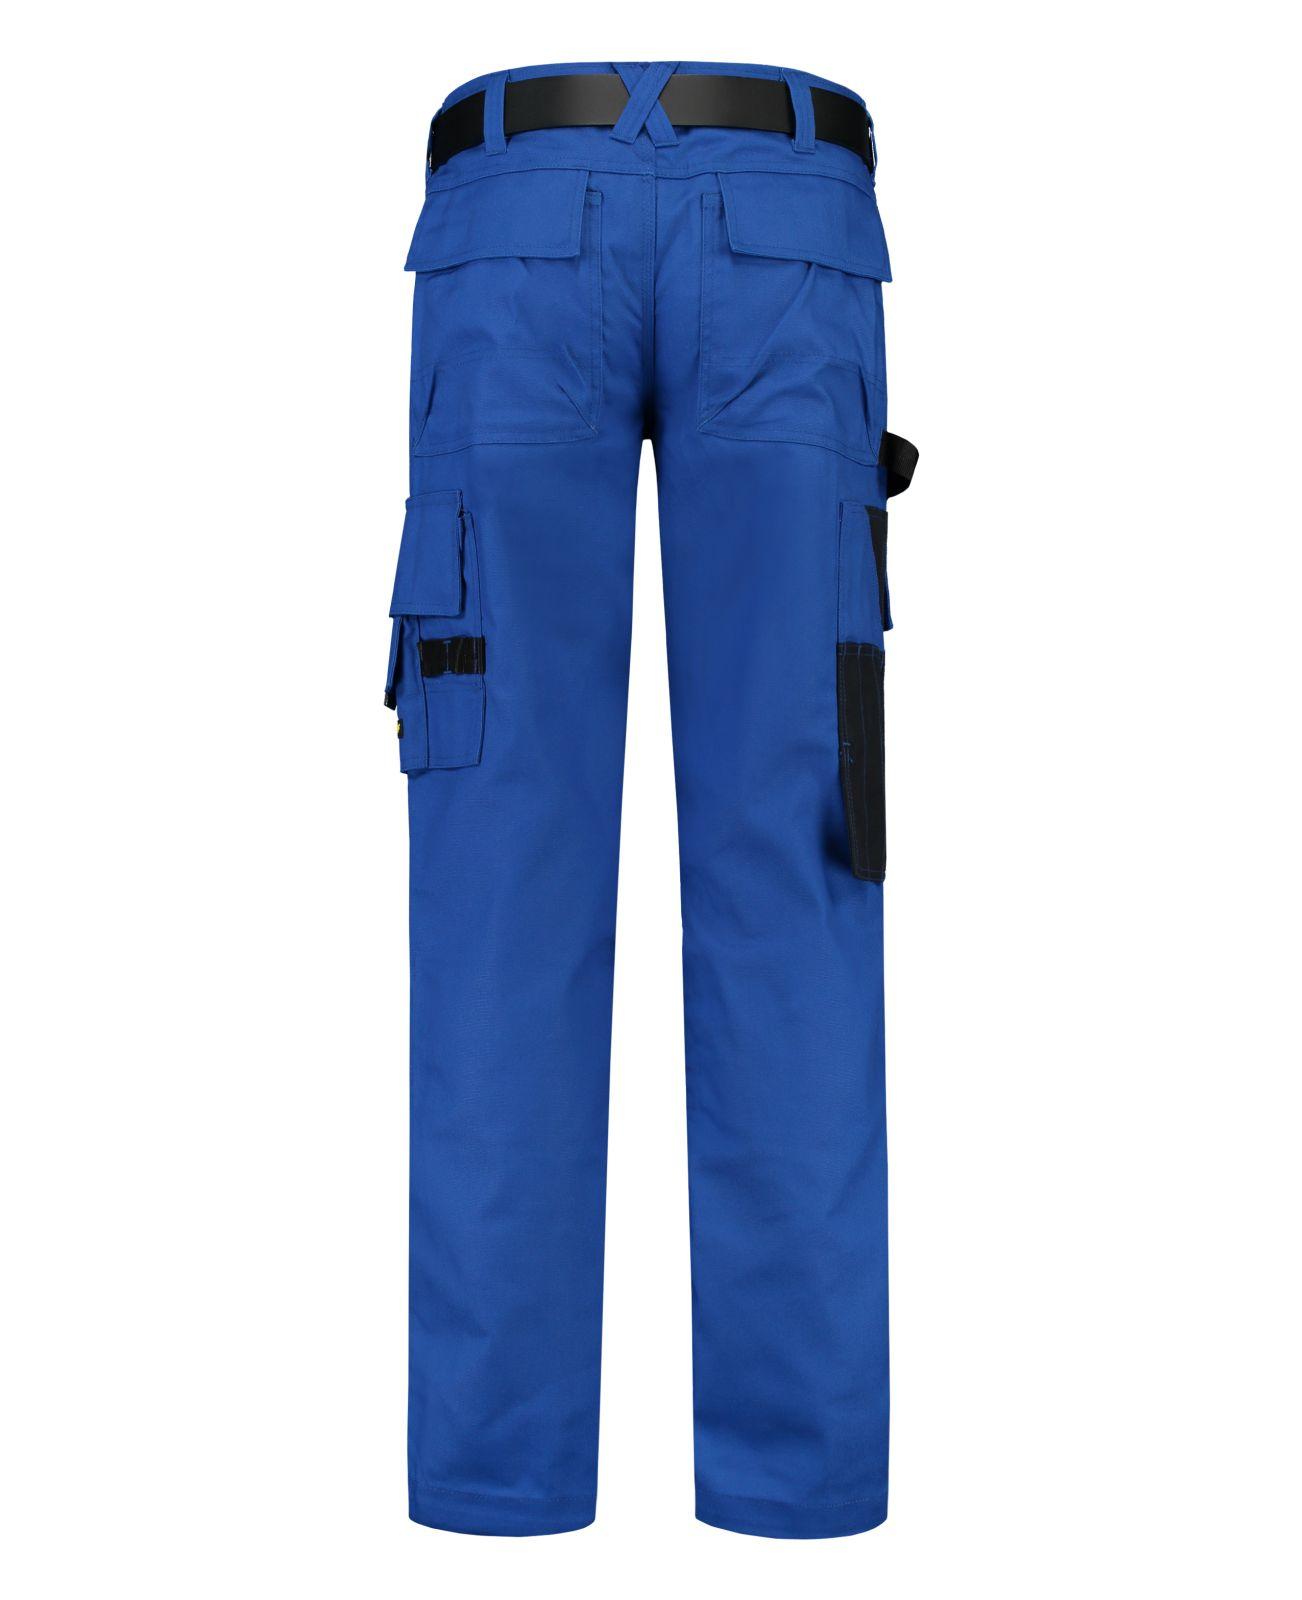 Tricorp Broeken 502009-TWC2000 koningsblauw-marineblauw(Royalnavy)